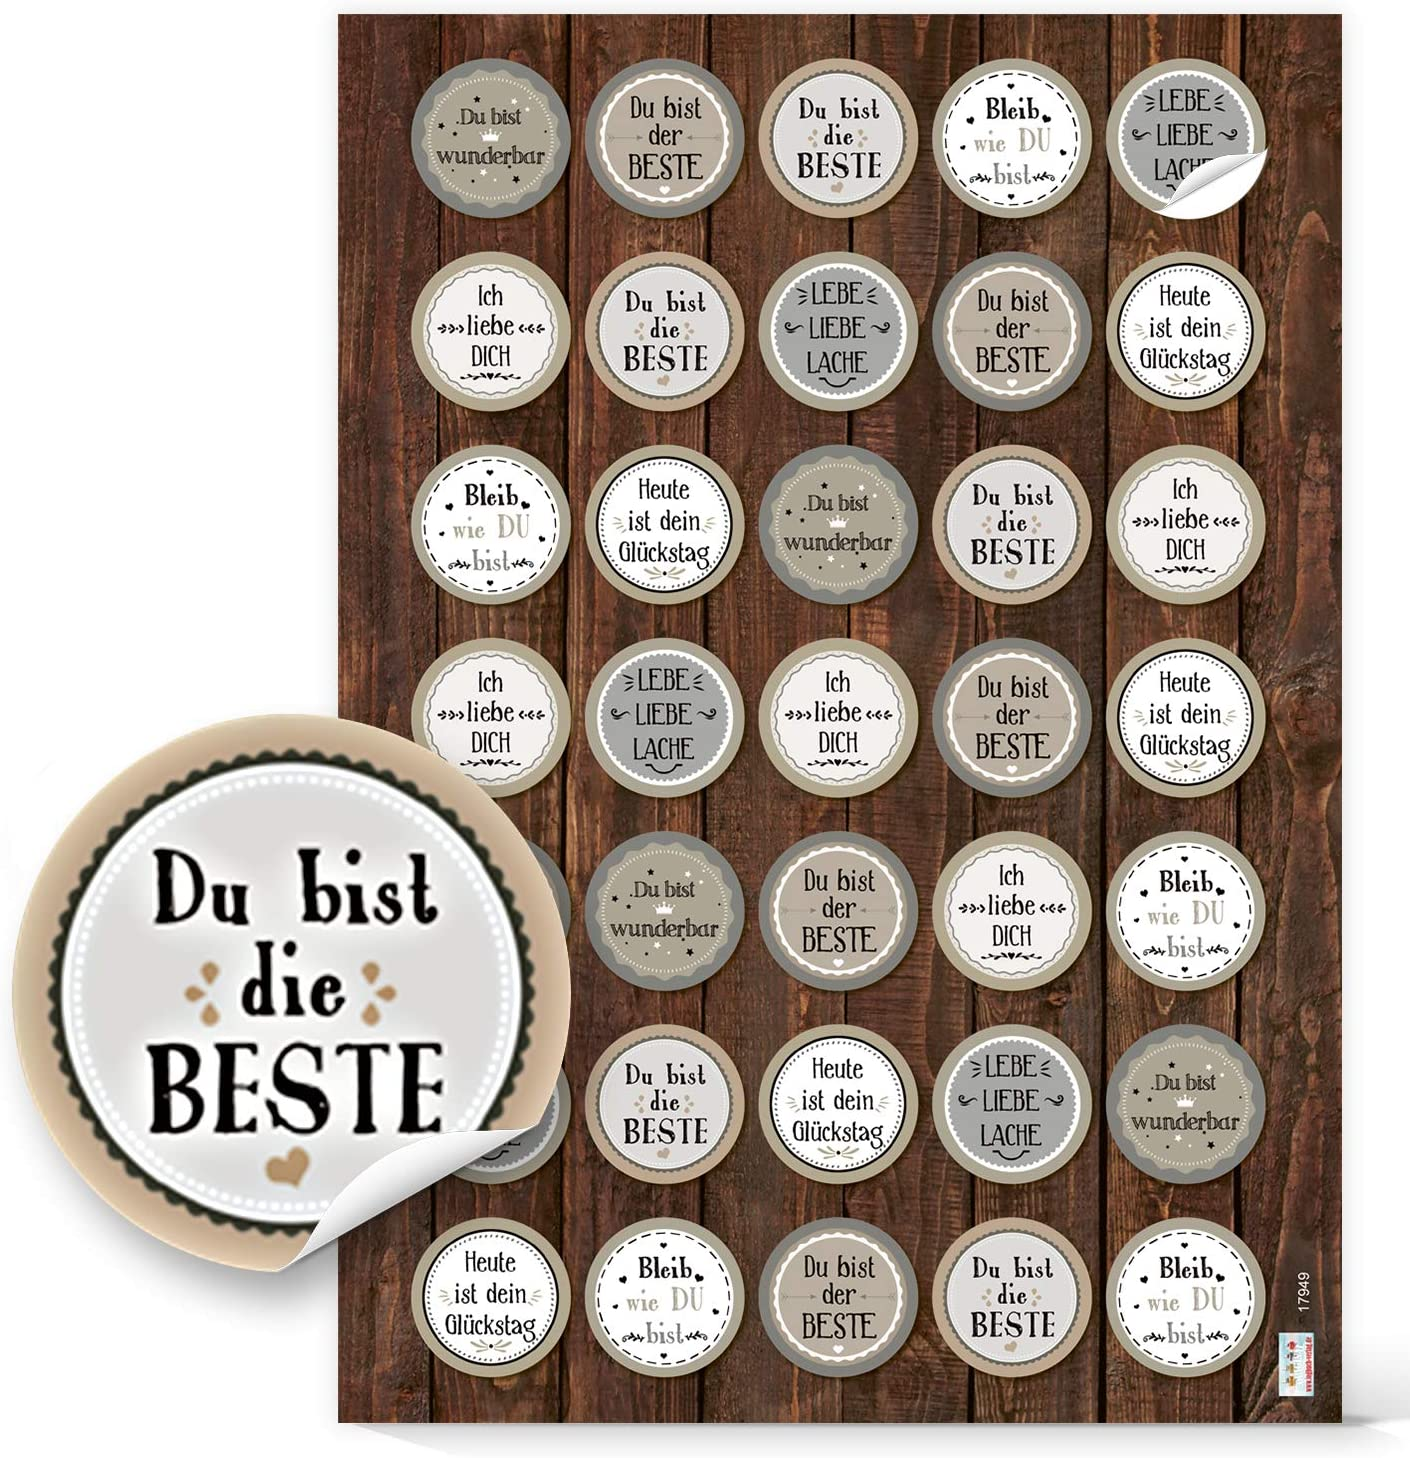 Geschenkaufkleber Mix Verzierung Verpackung Logbuch-Verlag Aufkleber SET schwarz wei/ß gr/ün Spr/ücheaufkleber Viel Gl/ück Danke Motivation